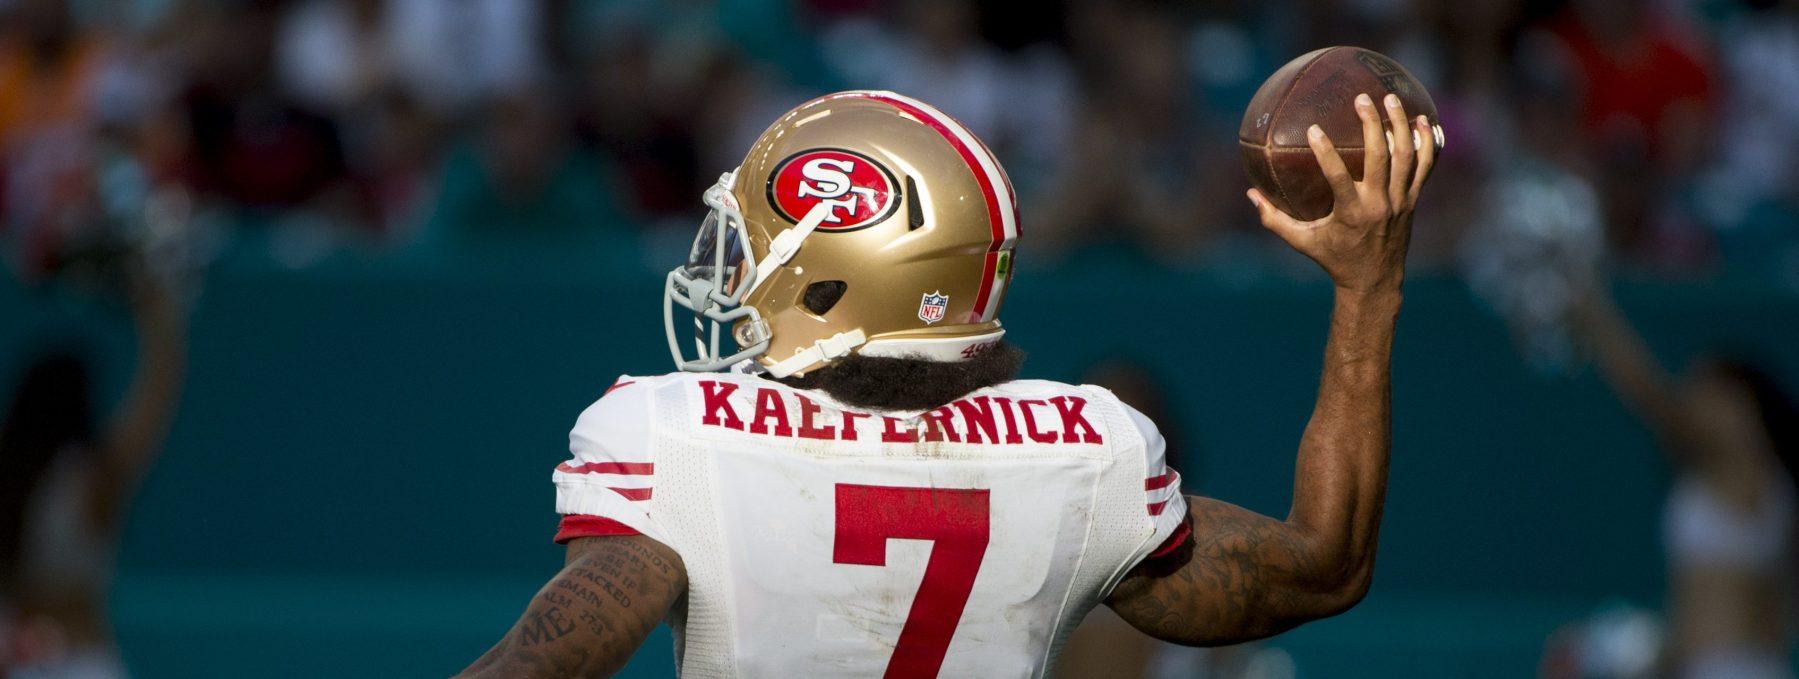 1901426e7b1 San Francisco 49ers Quarterback Colin Kaepernick (7) throws the ball during  the NFL football